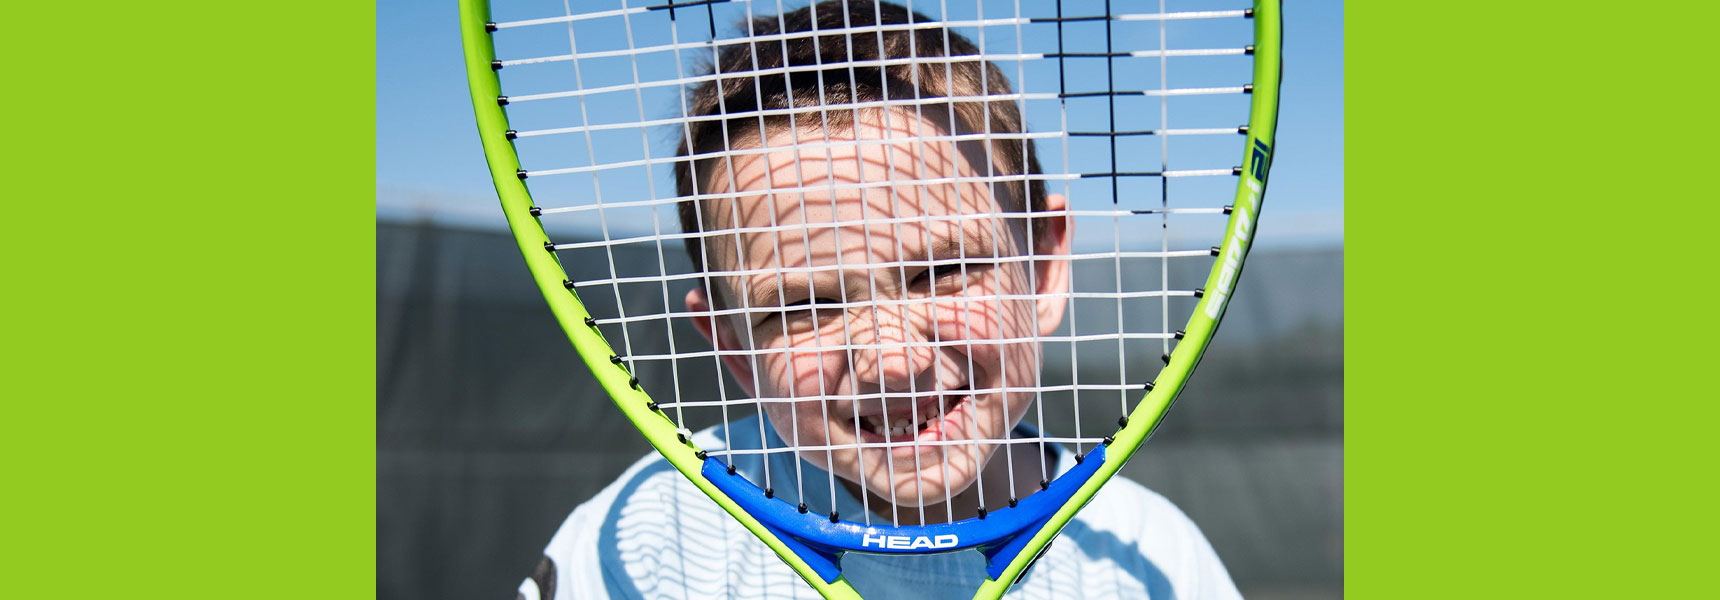 Young boy looking through a tennis racket